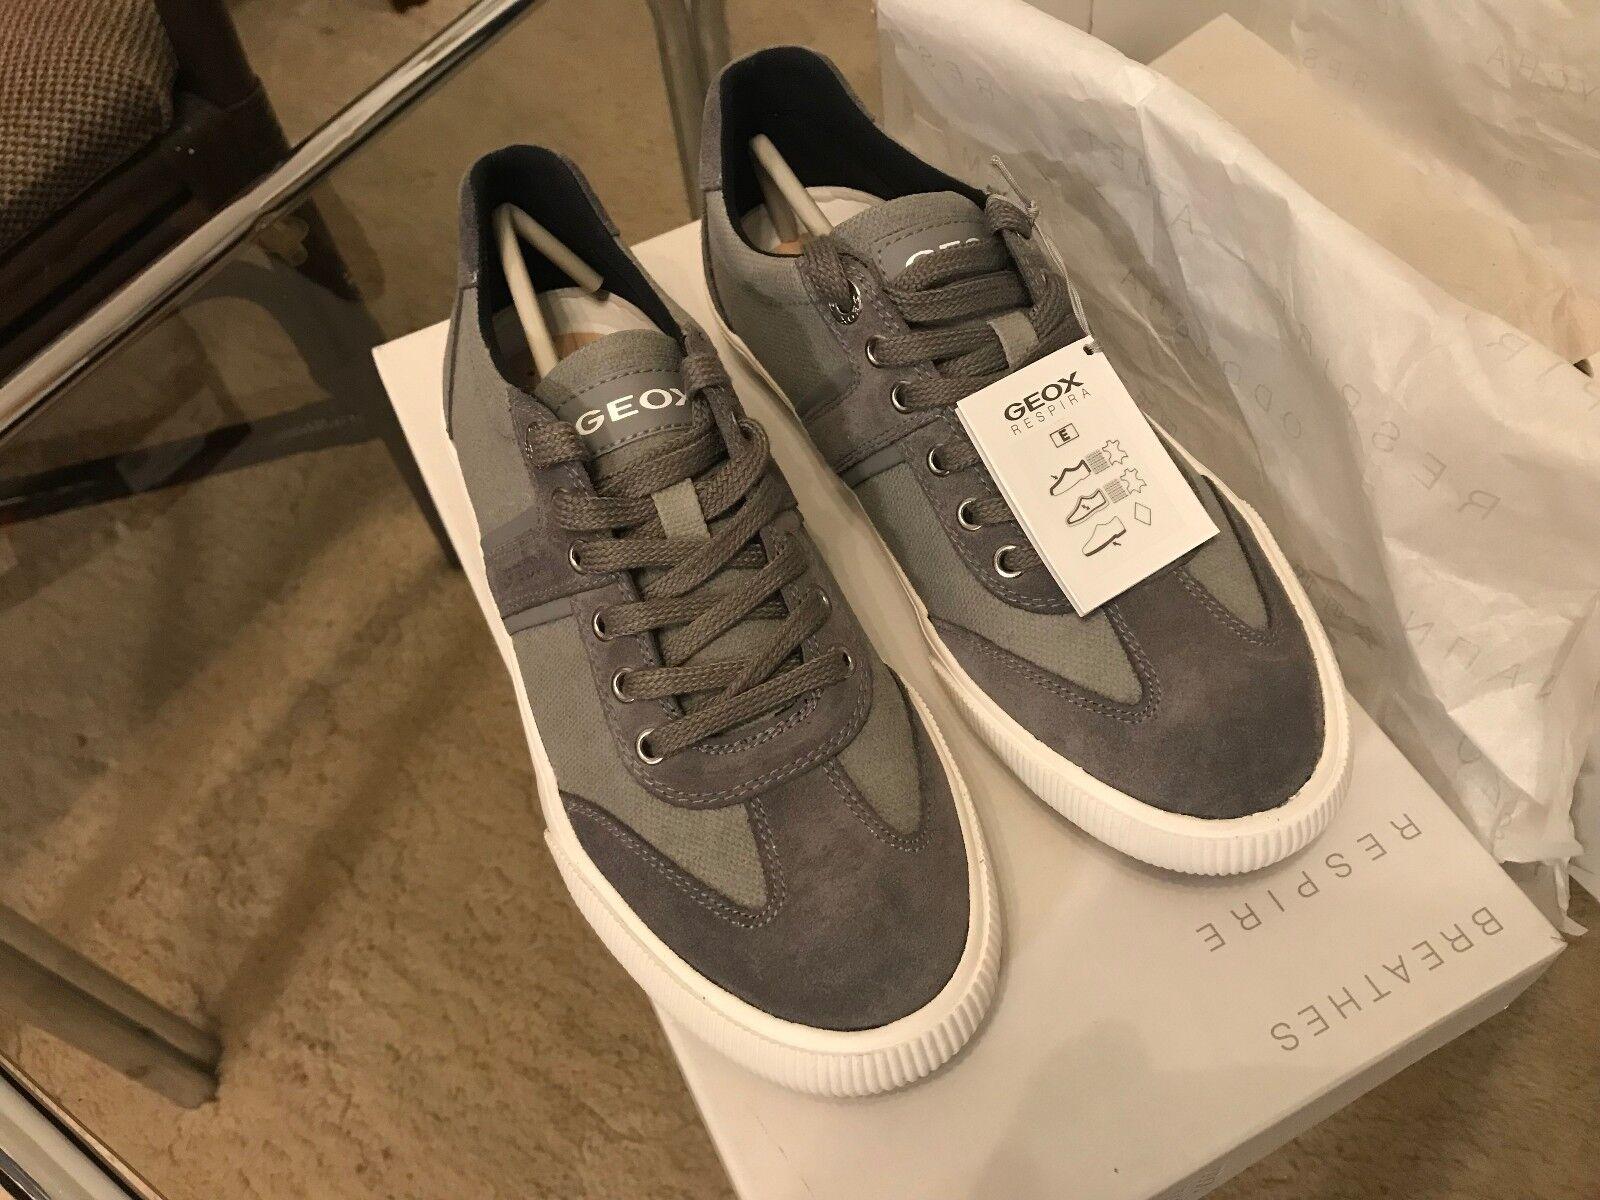 Geox Geox Geox Dart Sneaker Wildleder Herren Gr.40 US 7 Schuhe Grau U2Q2R01022C1006 NEU 50 b15d9f